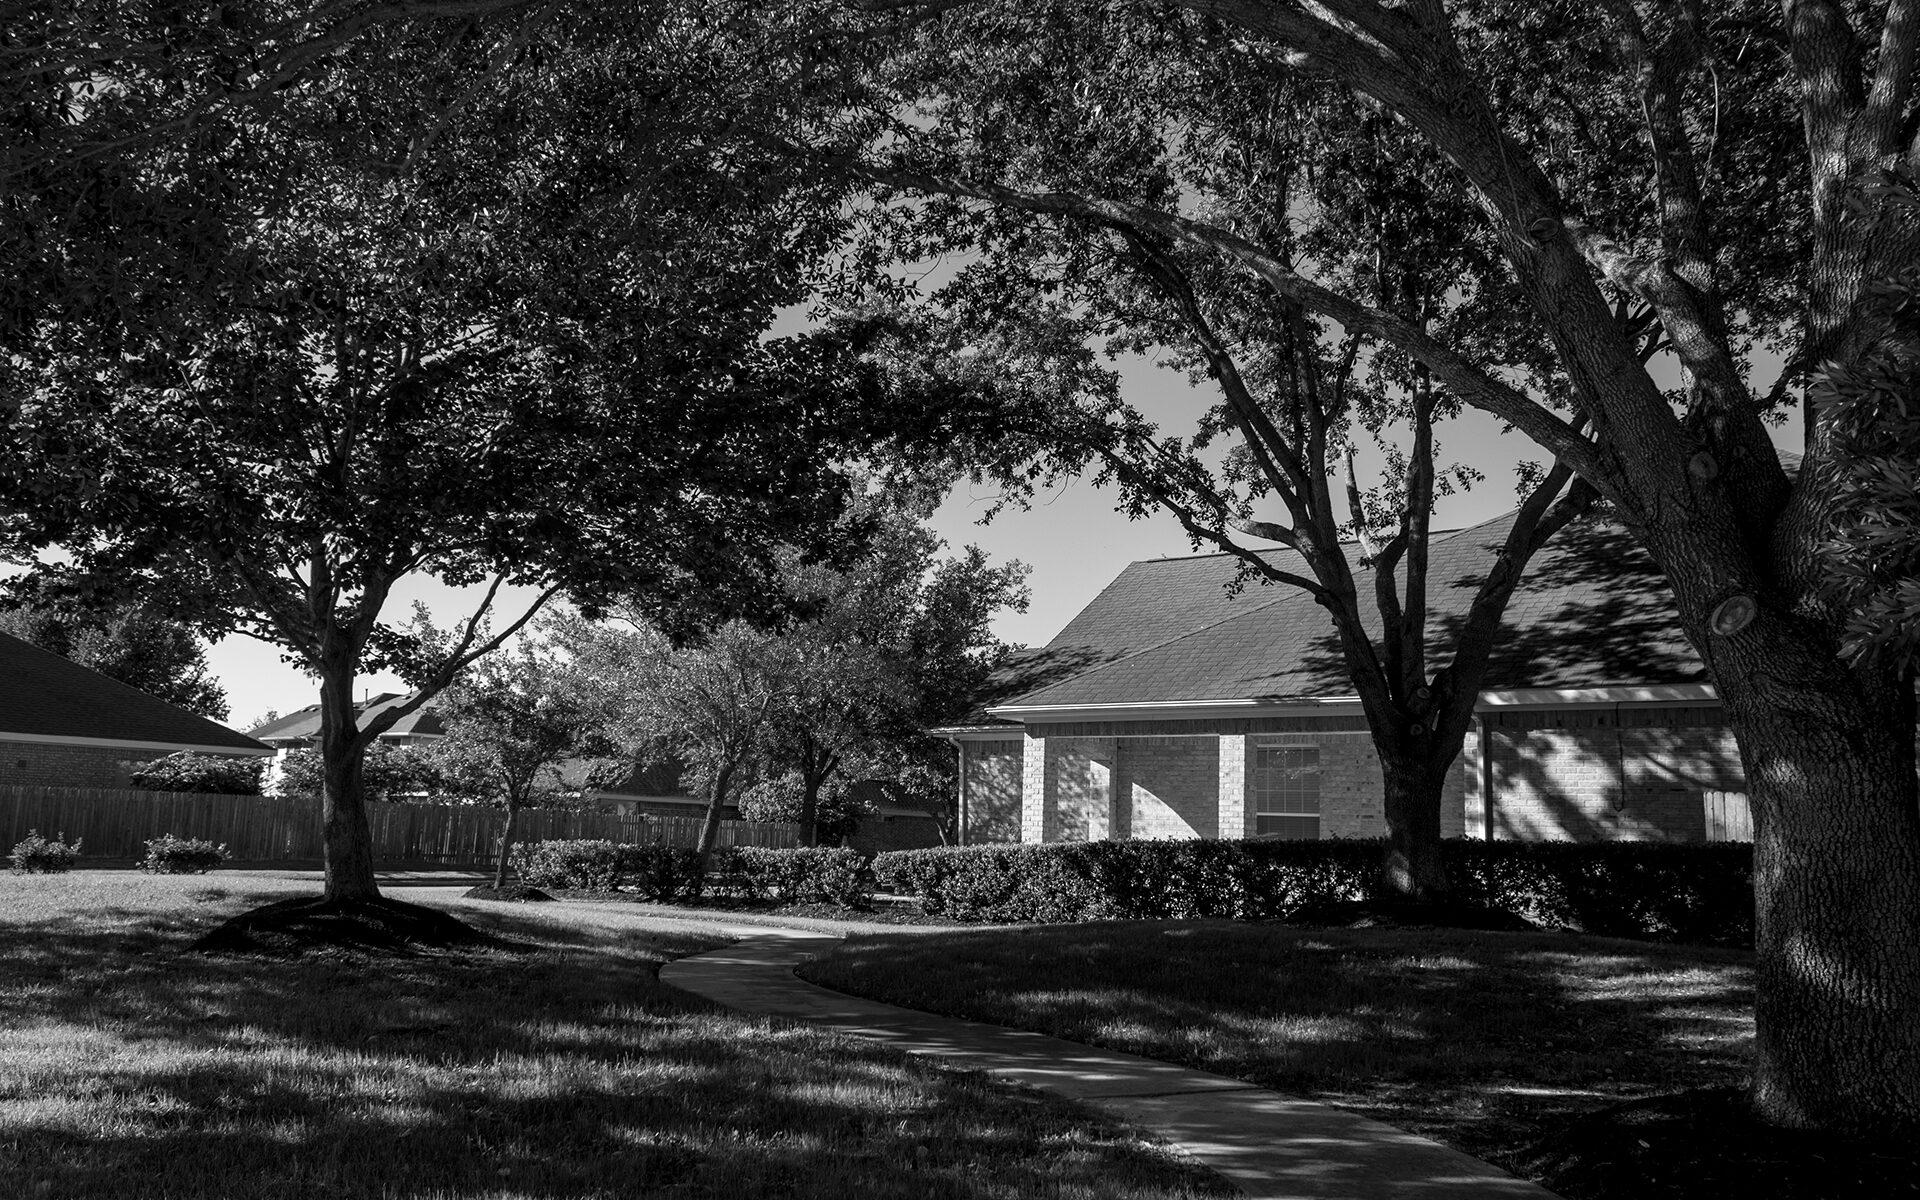 Black white photo of a suburban neighborhood with trees